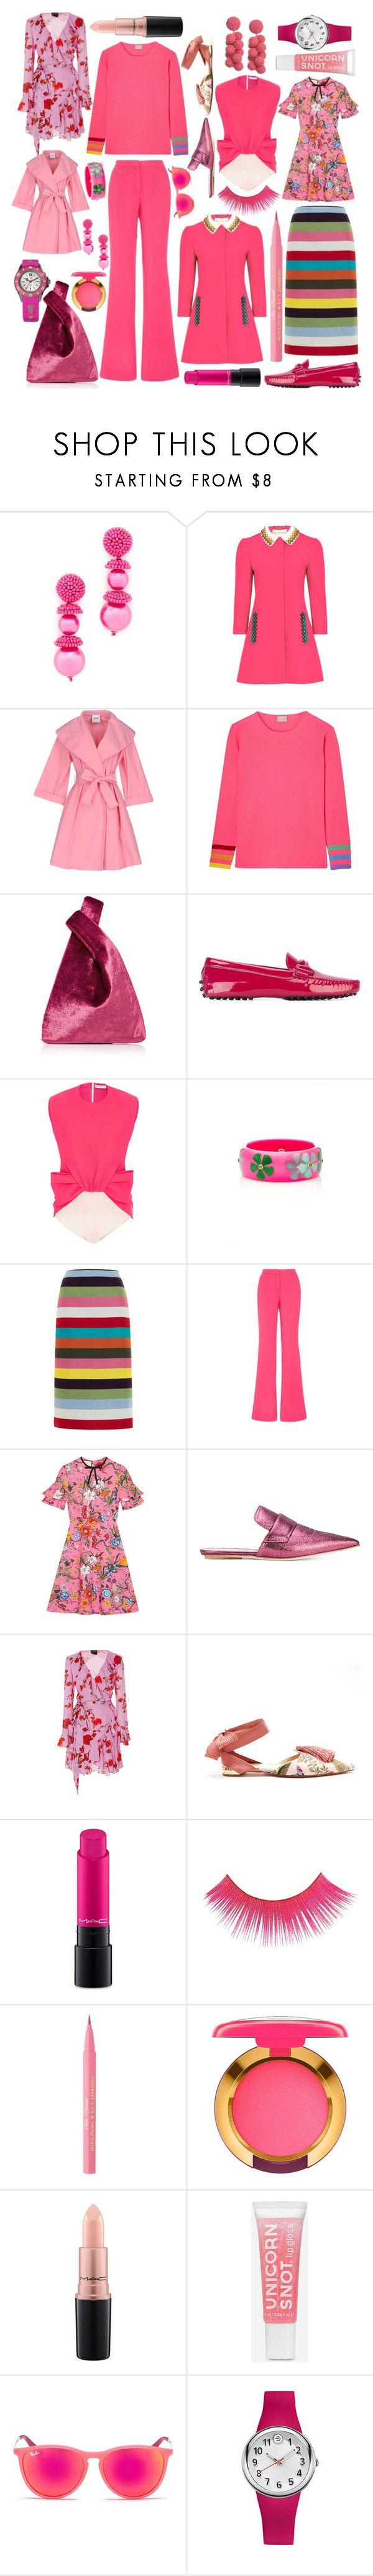 """A Few of My Favorite Pinks!"" by nicoletrail-1 ❤ liked on Polyvore featuring Oscar de la Renta, Mary Katrantzou, Moschino Cheap & Chic, Orwell + Austen, Hayward, Tod's, Mark Davis, Gucci, Marni and Cynthia Rowley"